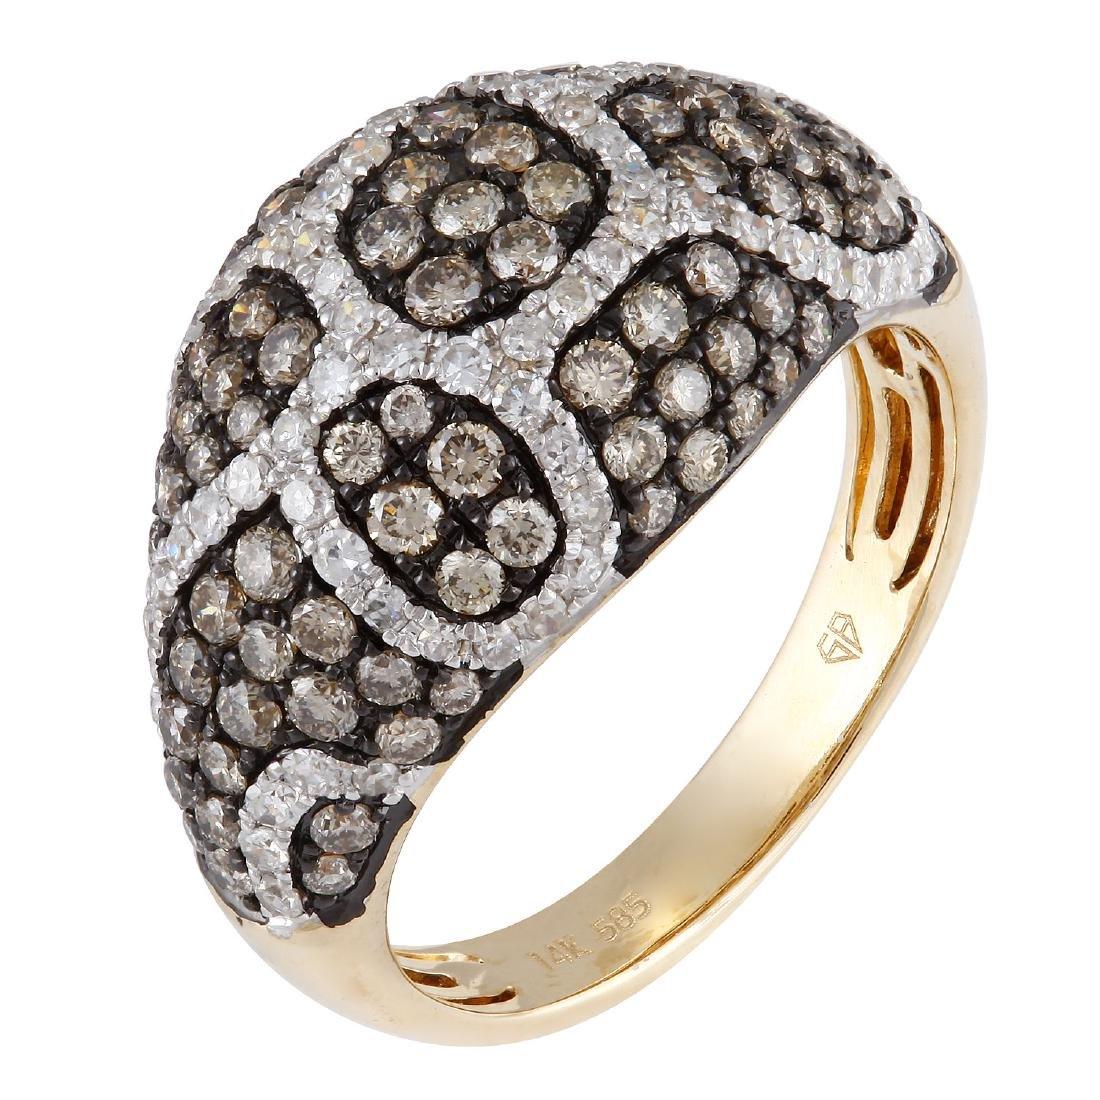 14KT Yellow Gold 1.79ctw Women's Diamond Cocktail Ring - 2